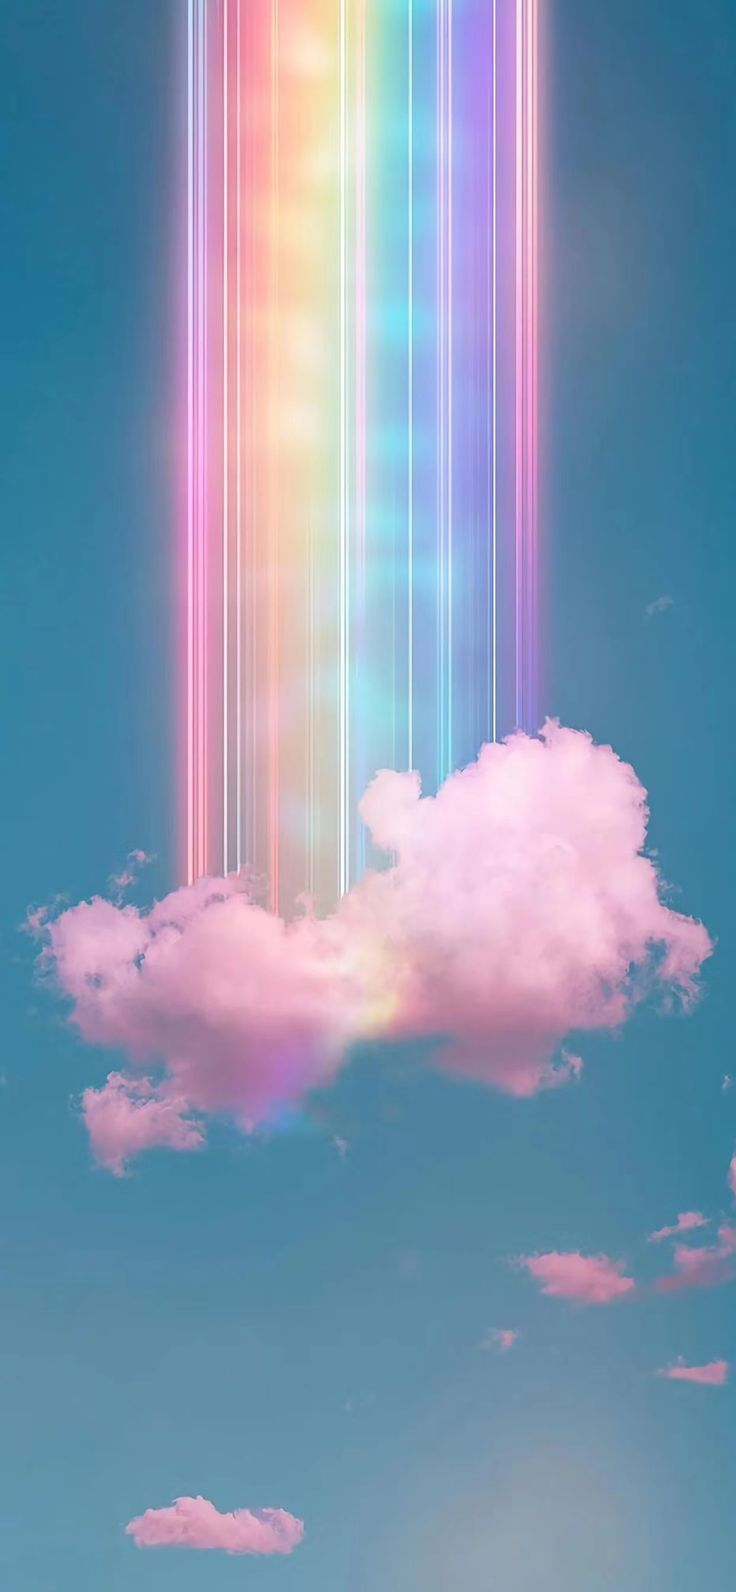 Ipad Wallpaper Aesthetic Horizontal Pretty Wallpapers Backgrounds Rainbow Wallpaper Rainbow Wallpaper Iphone